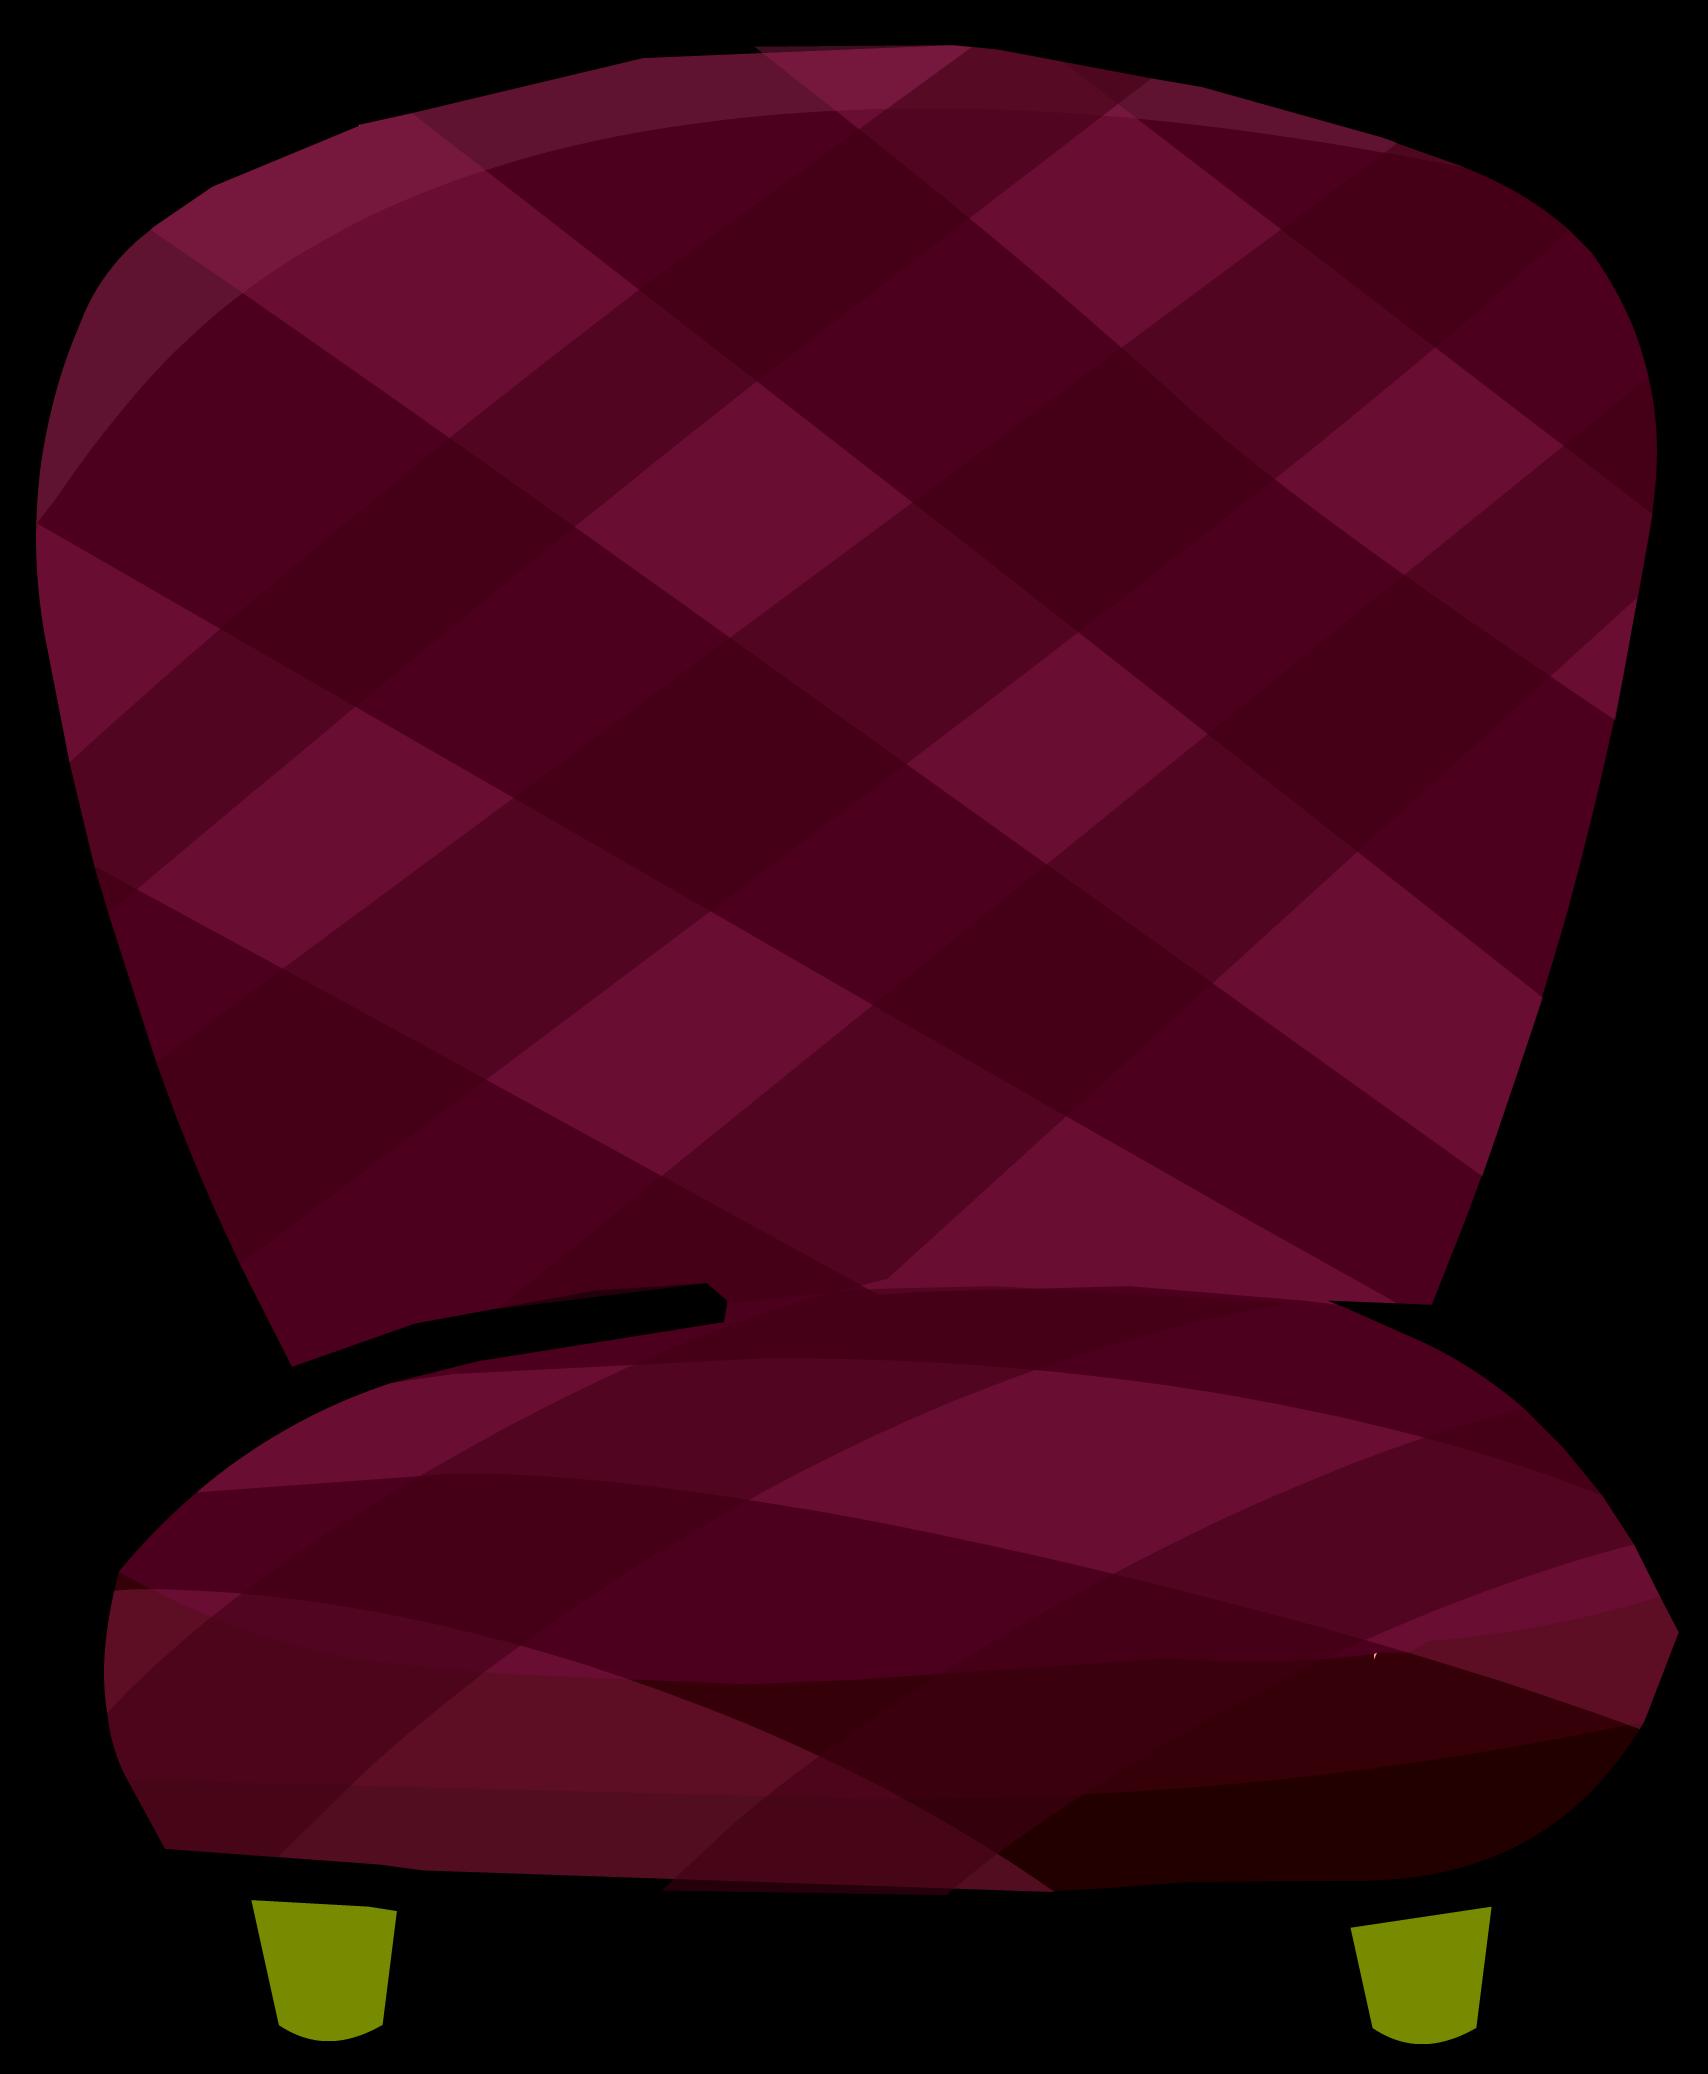 Furniture clipart purple chair. Burgundy club penguin rewritten